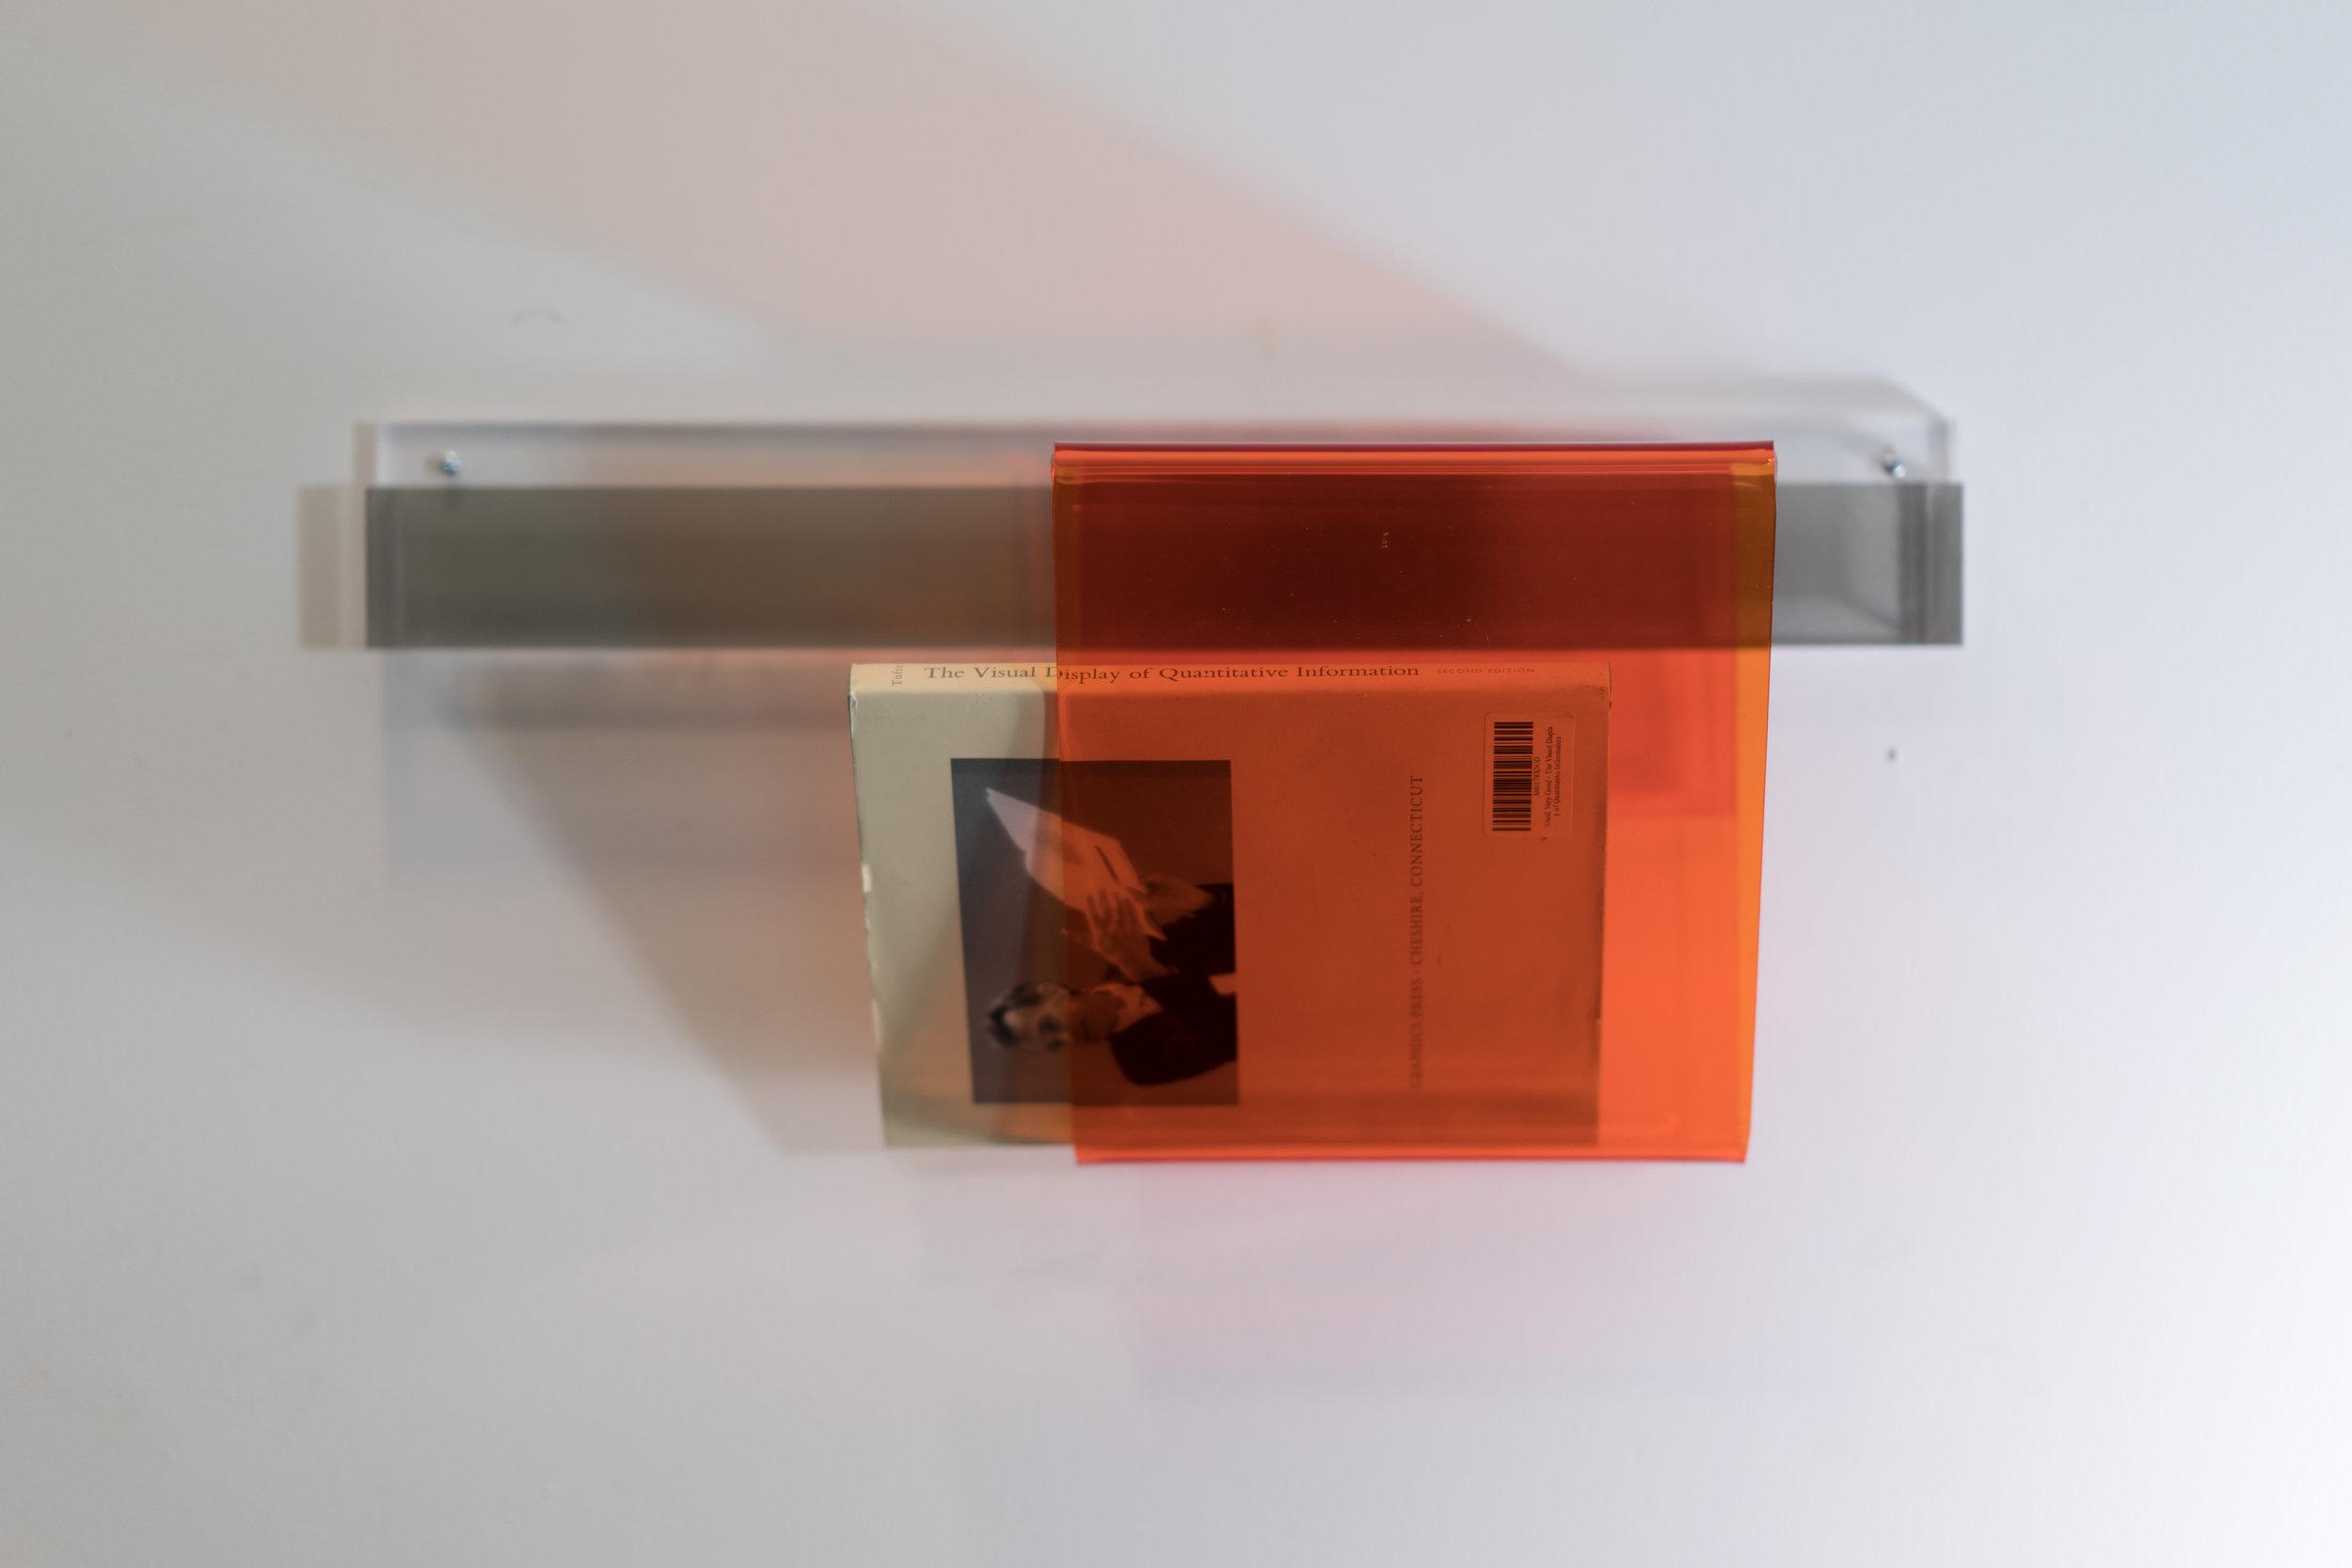 DSC06880-1.JPG